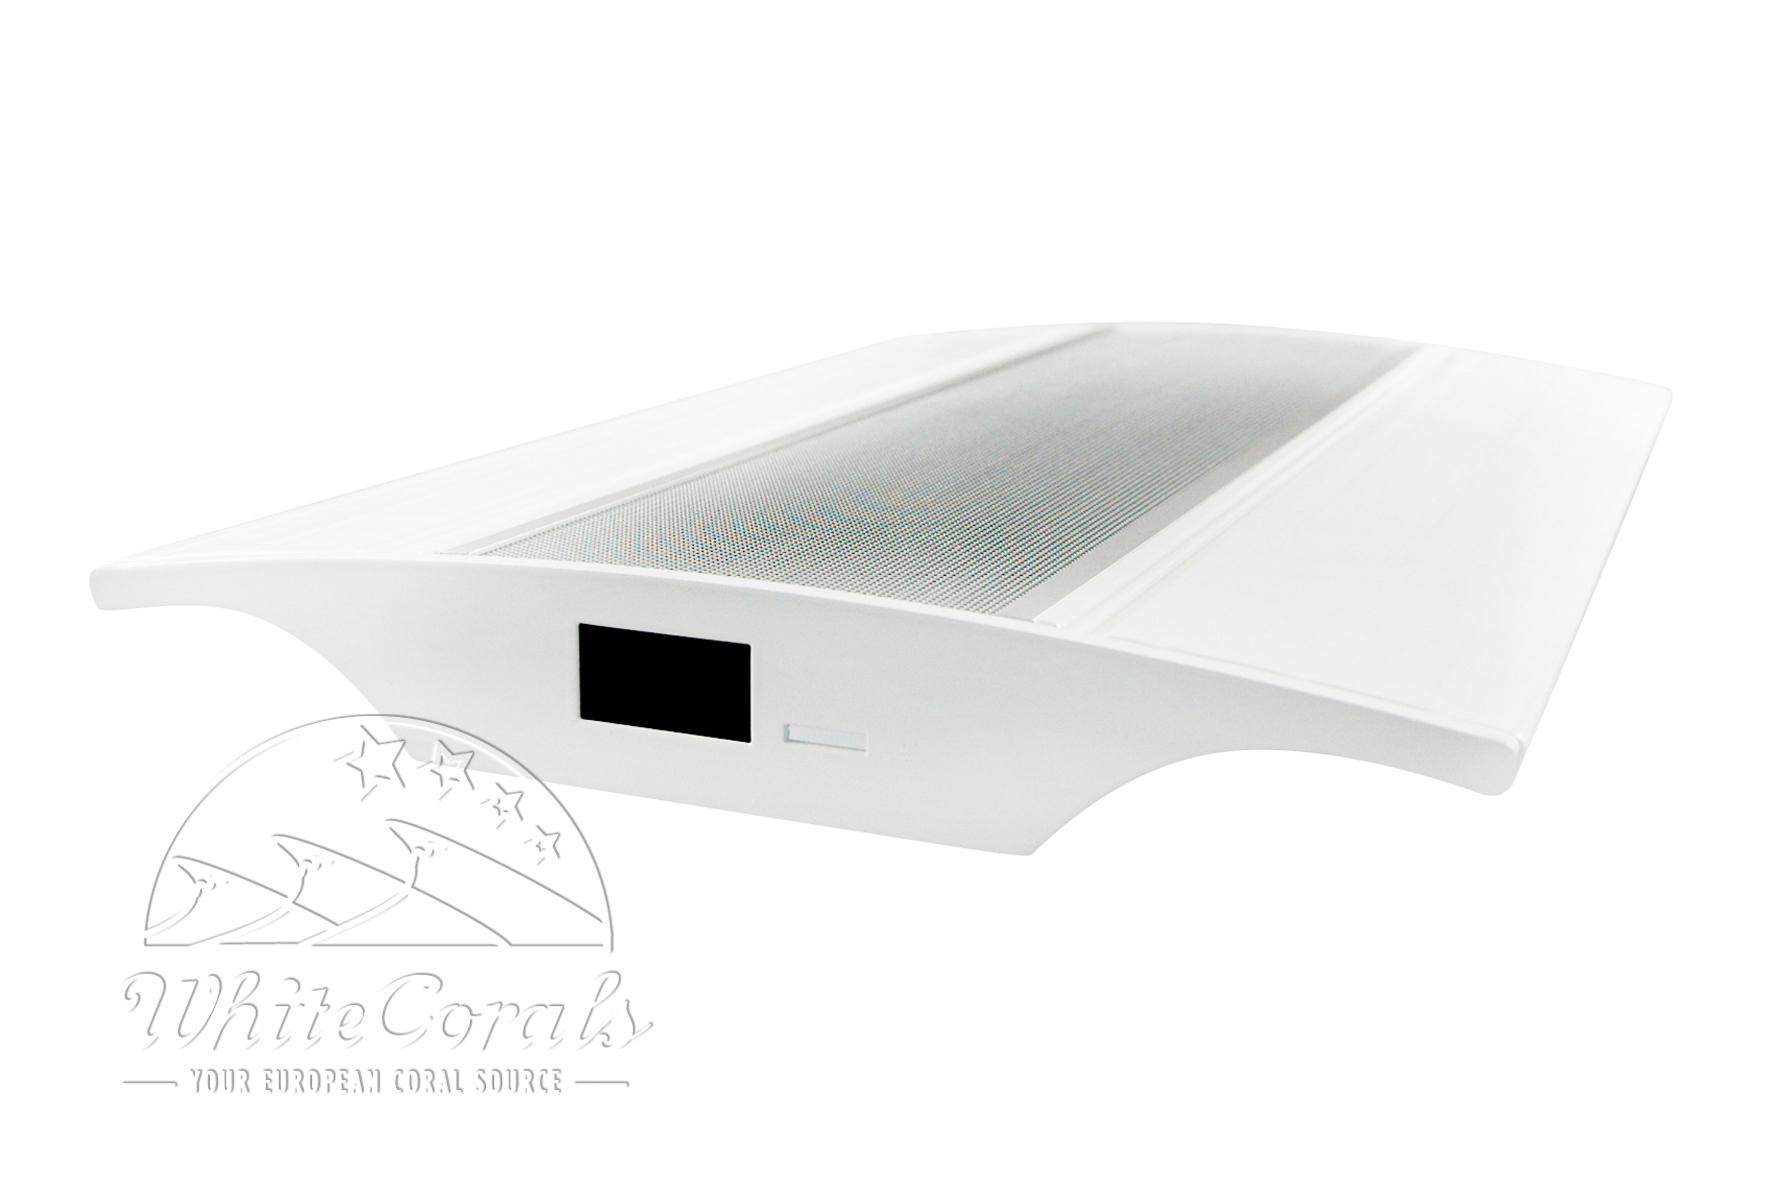 Giesemann VerVve one - LED marine - 365 mm - polarweiss